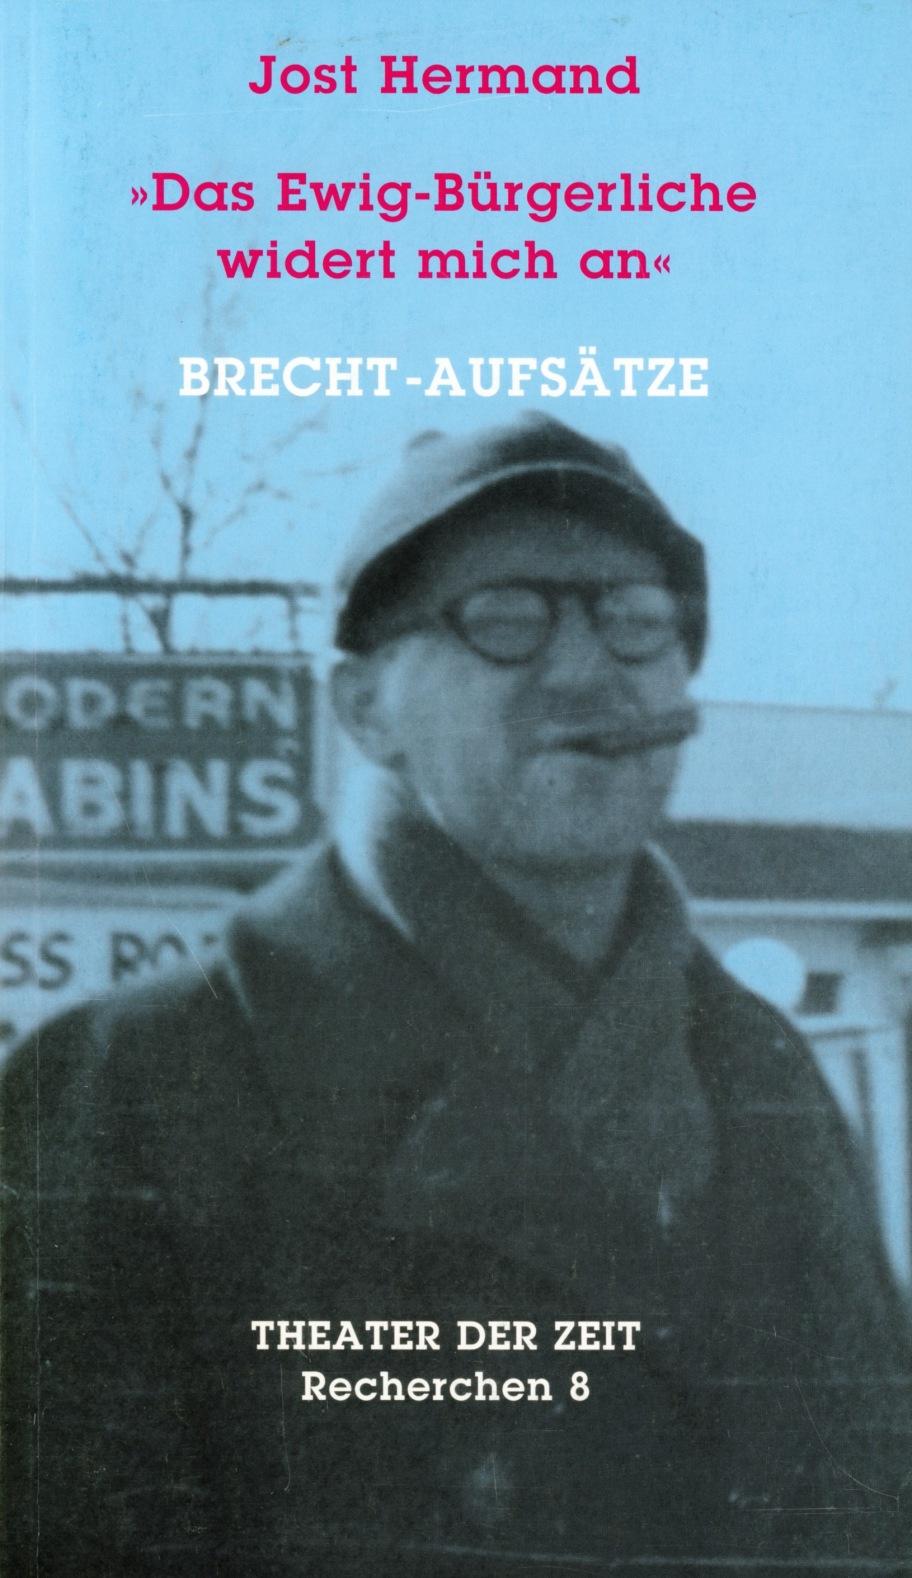 Jost Hermand: Das Ewig-Bürgerliche widert mich an